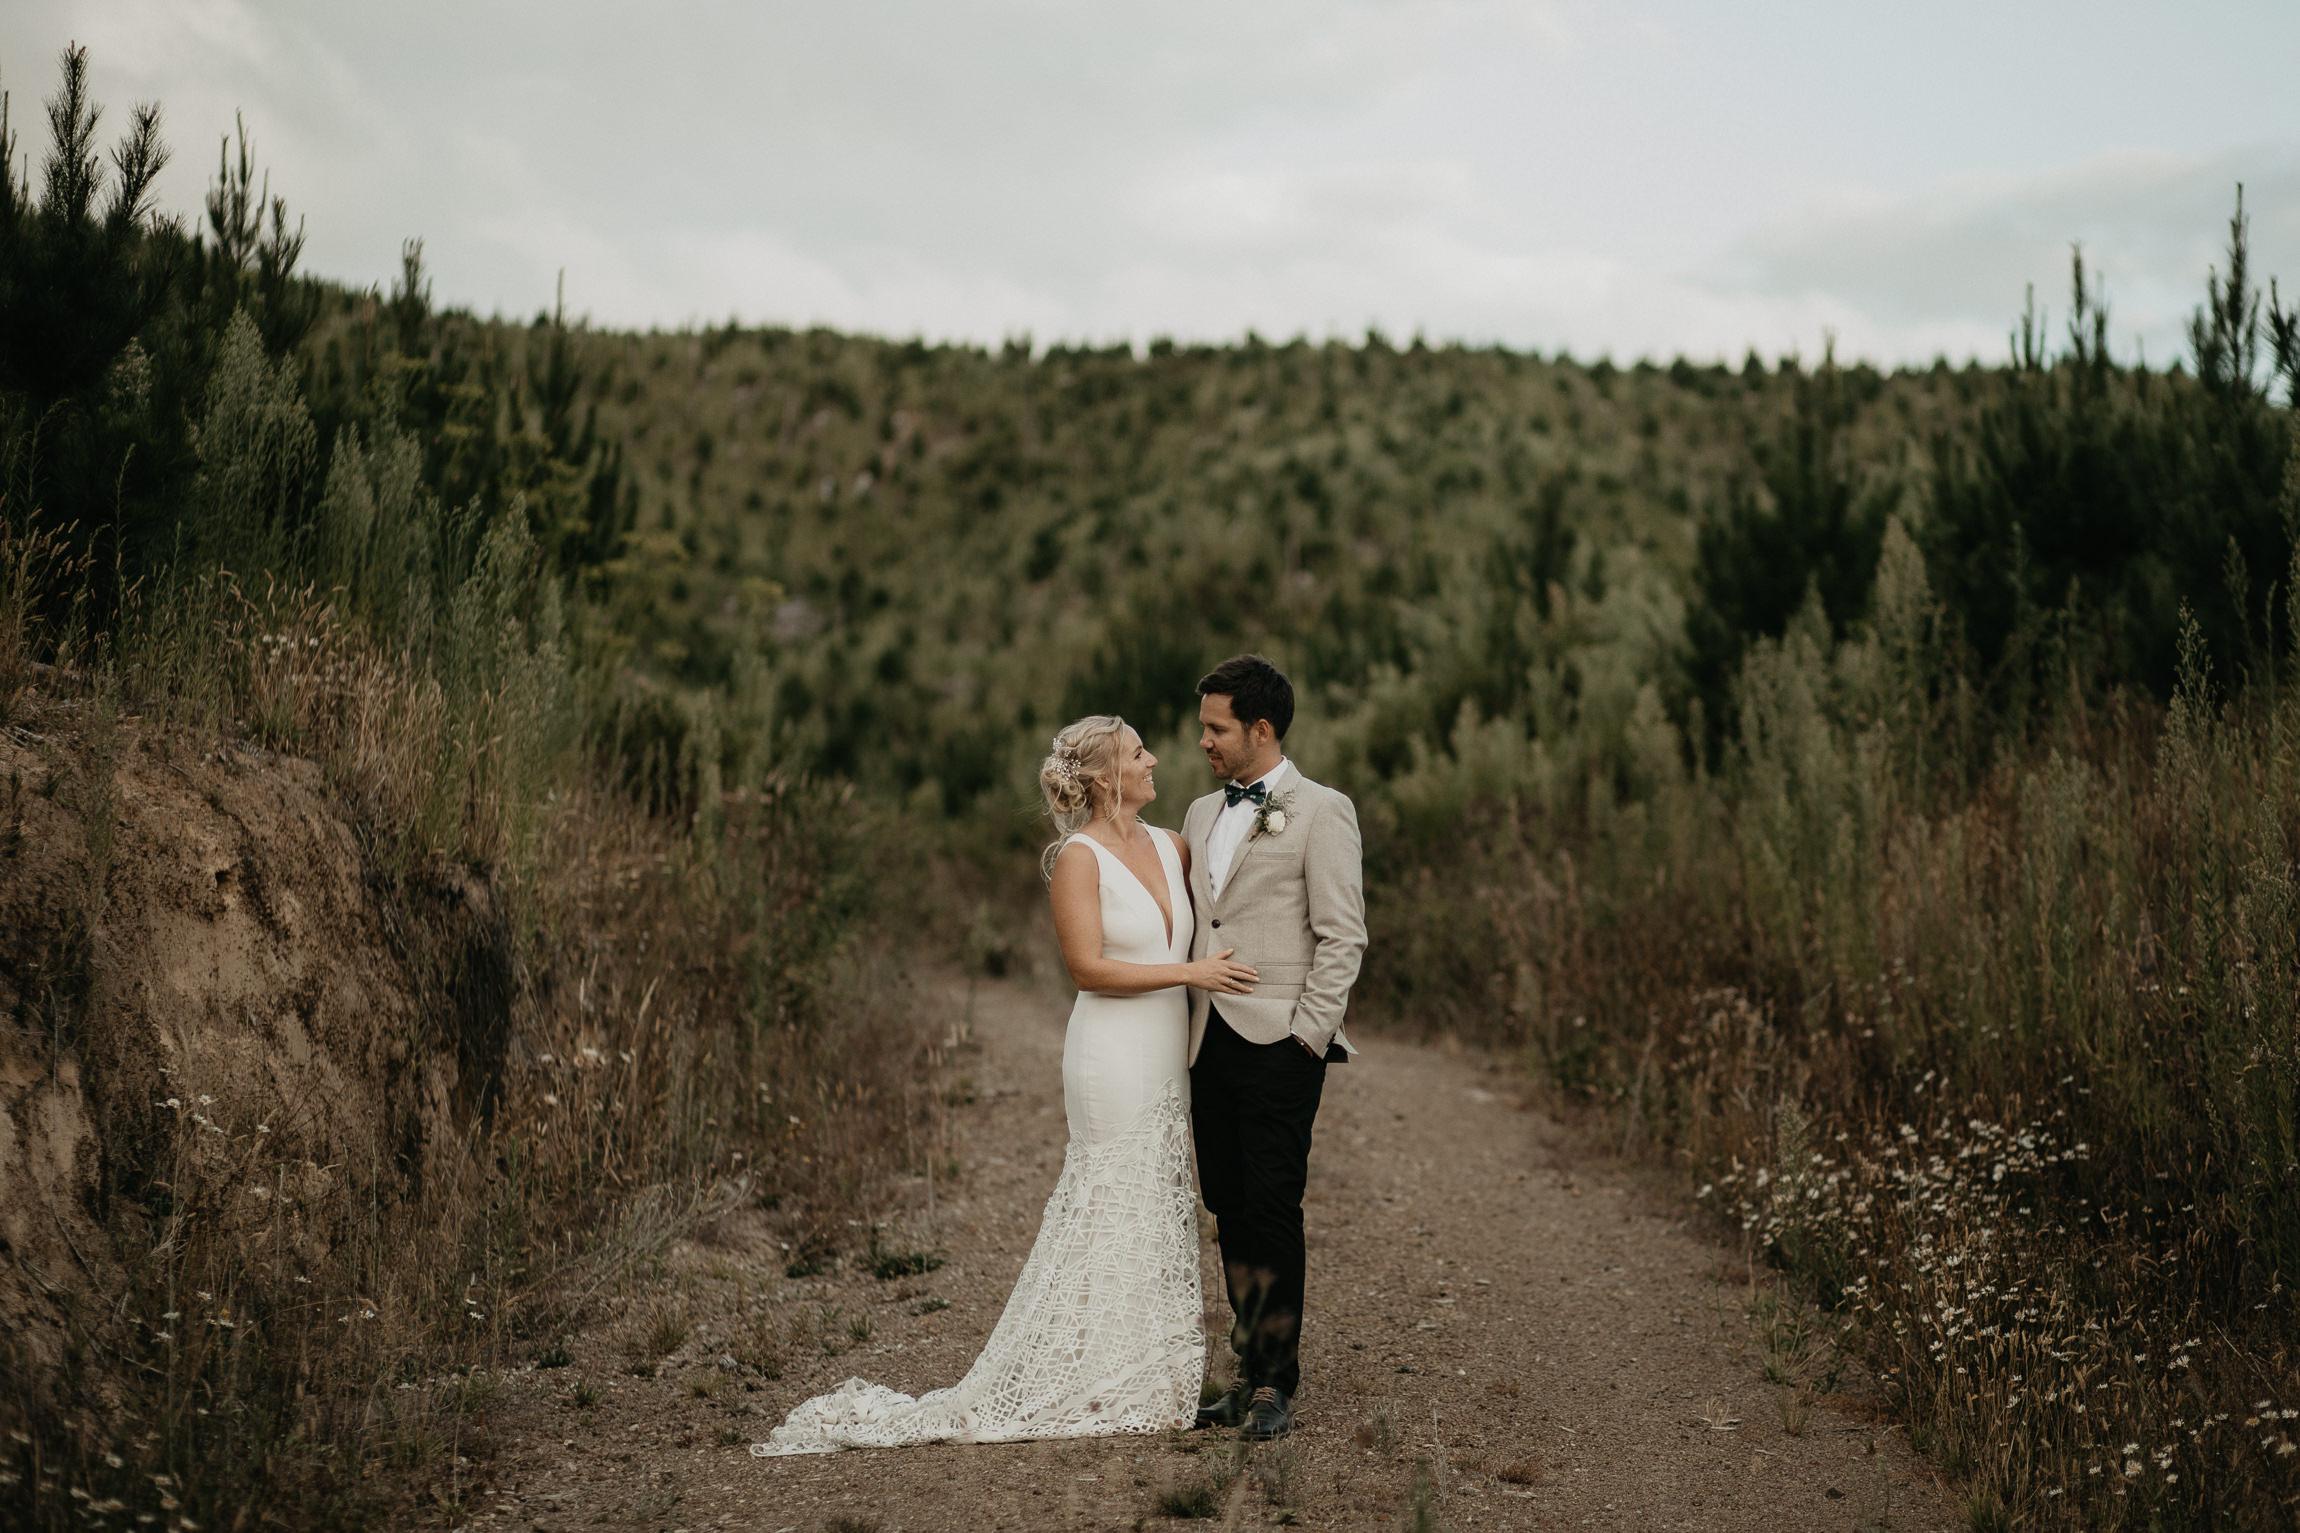 oldforestschool-wedding-blog-169.jpg